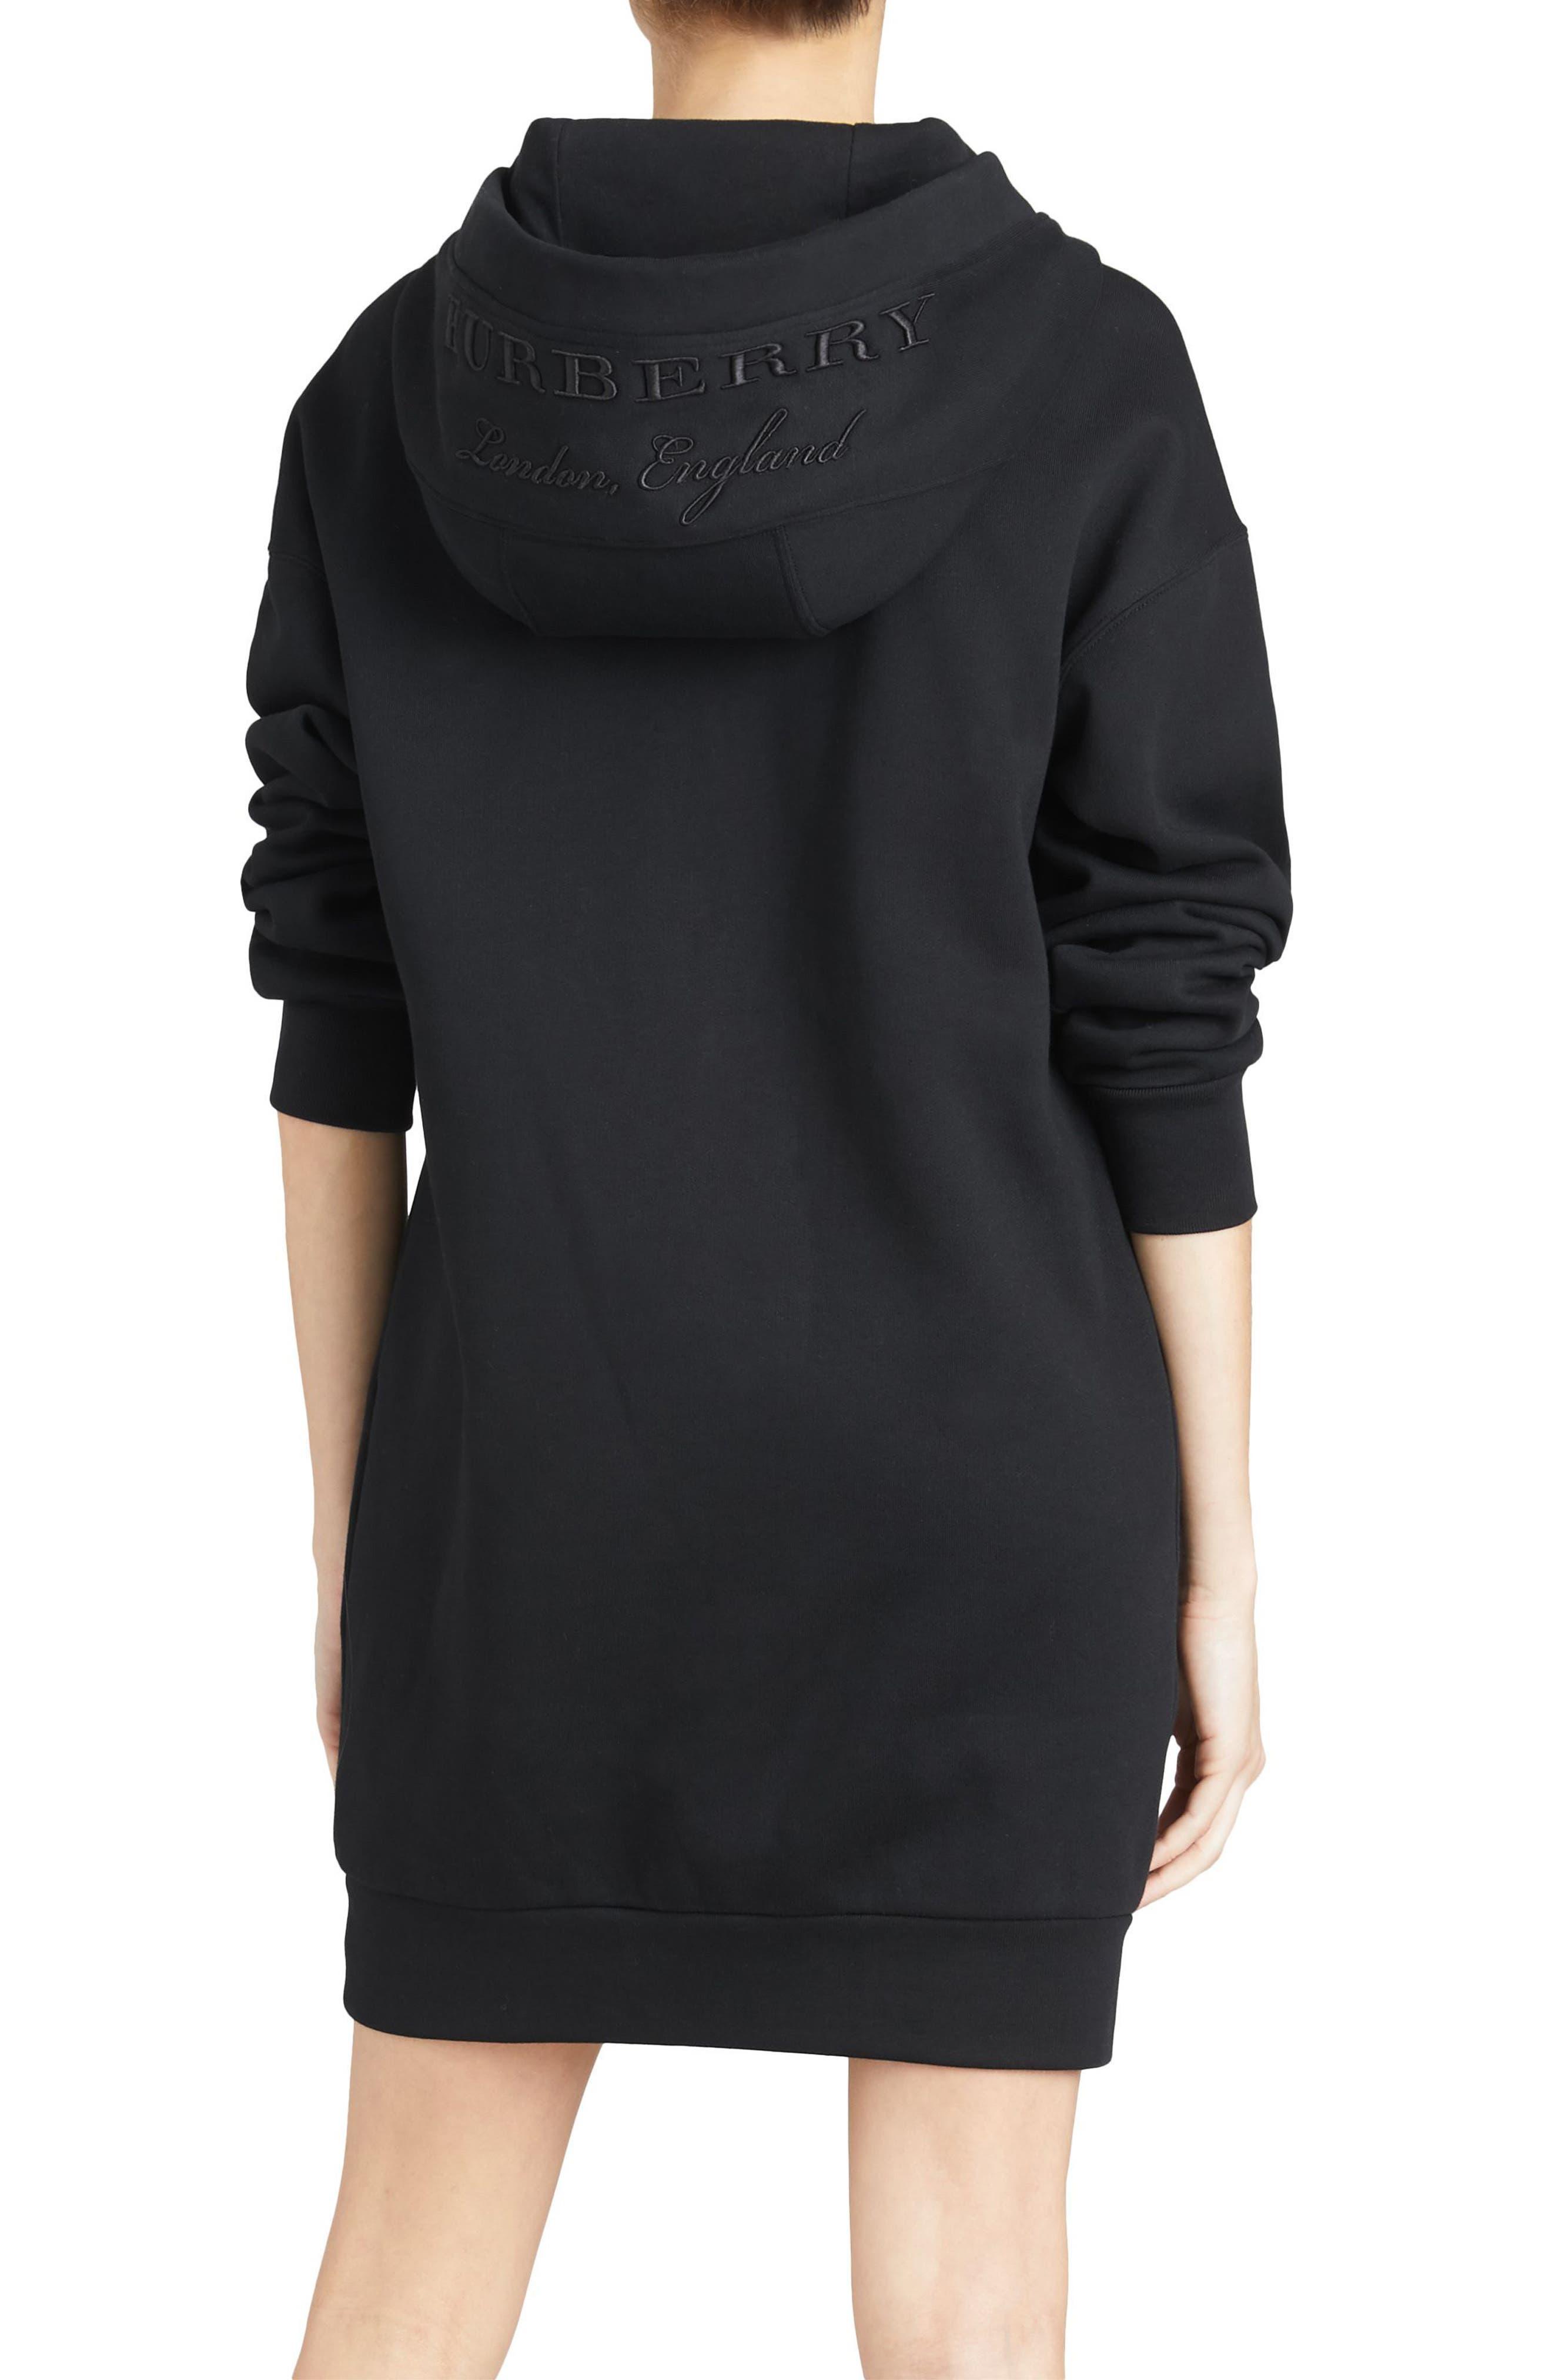 Cardeiver Jersey Sweatshirt Dress,                             Alternate thumbnail 2, color,                             001